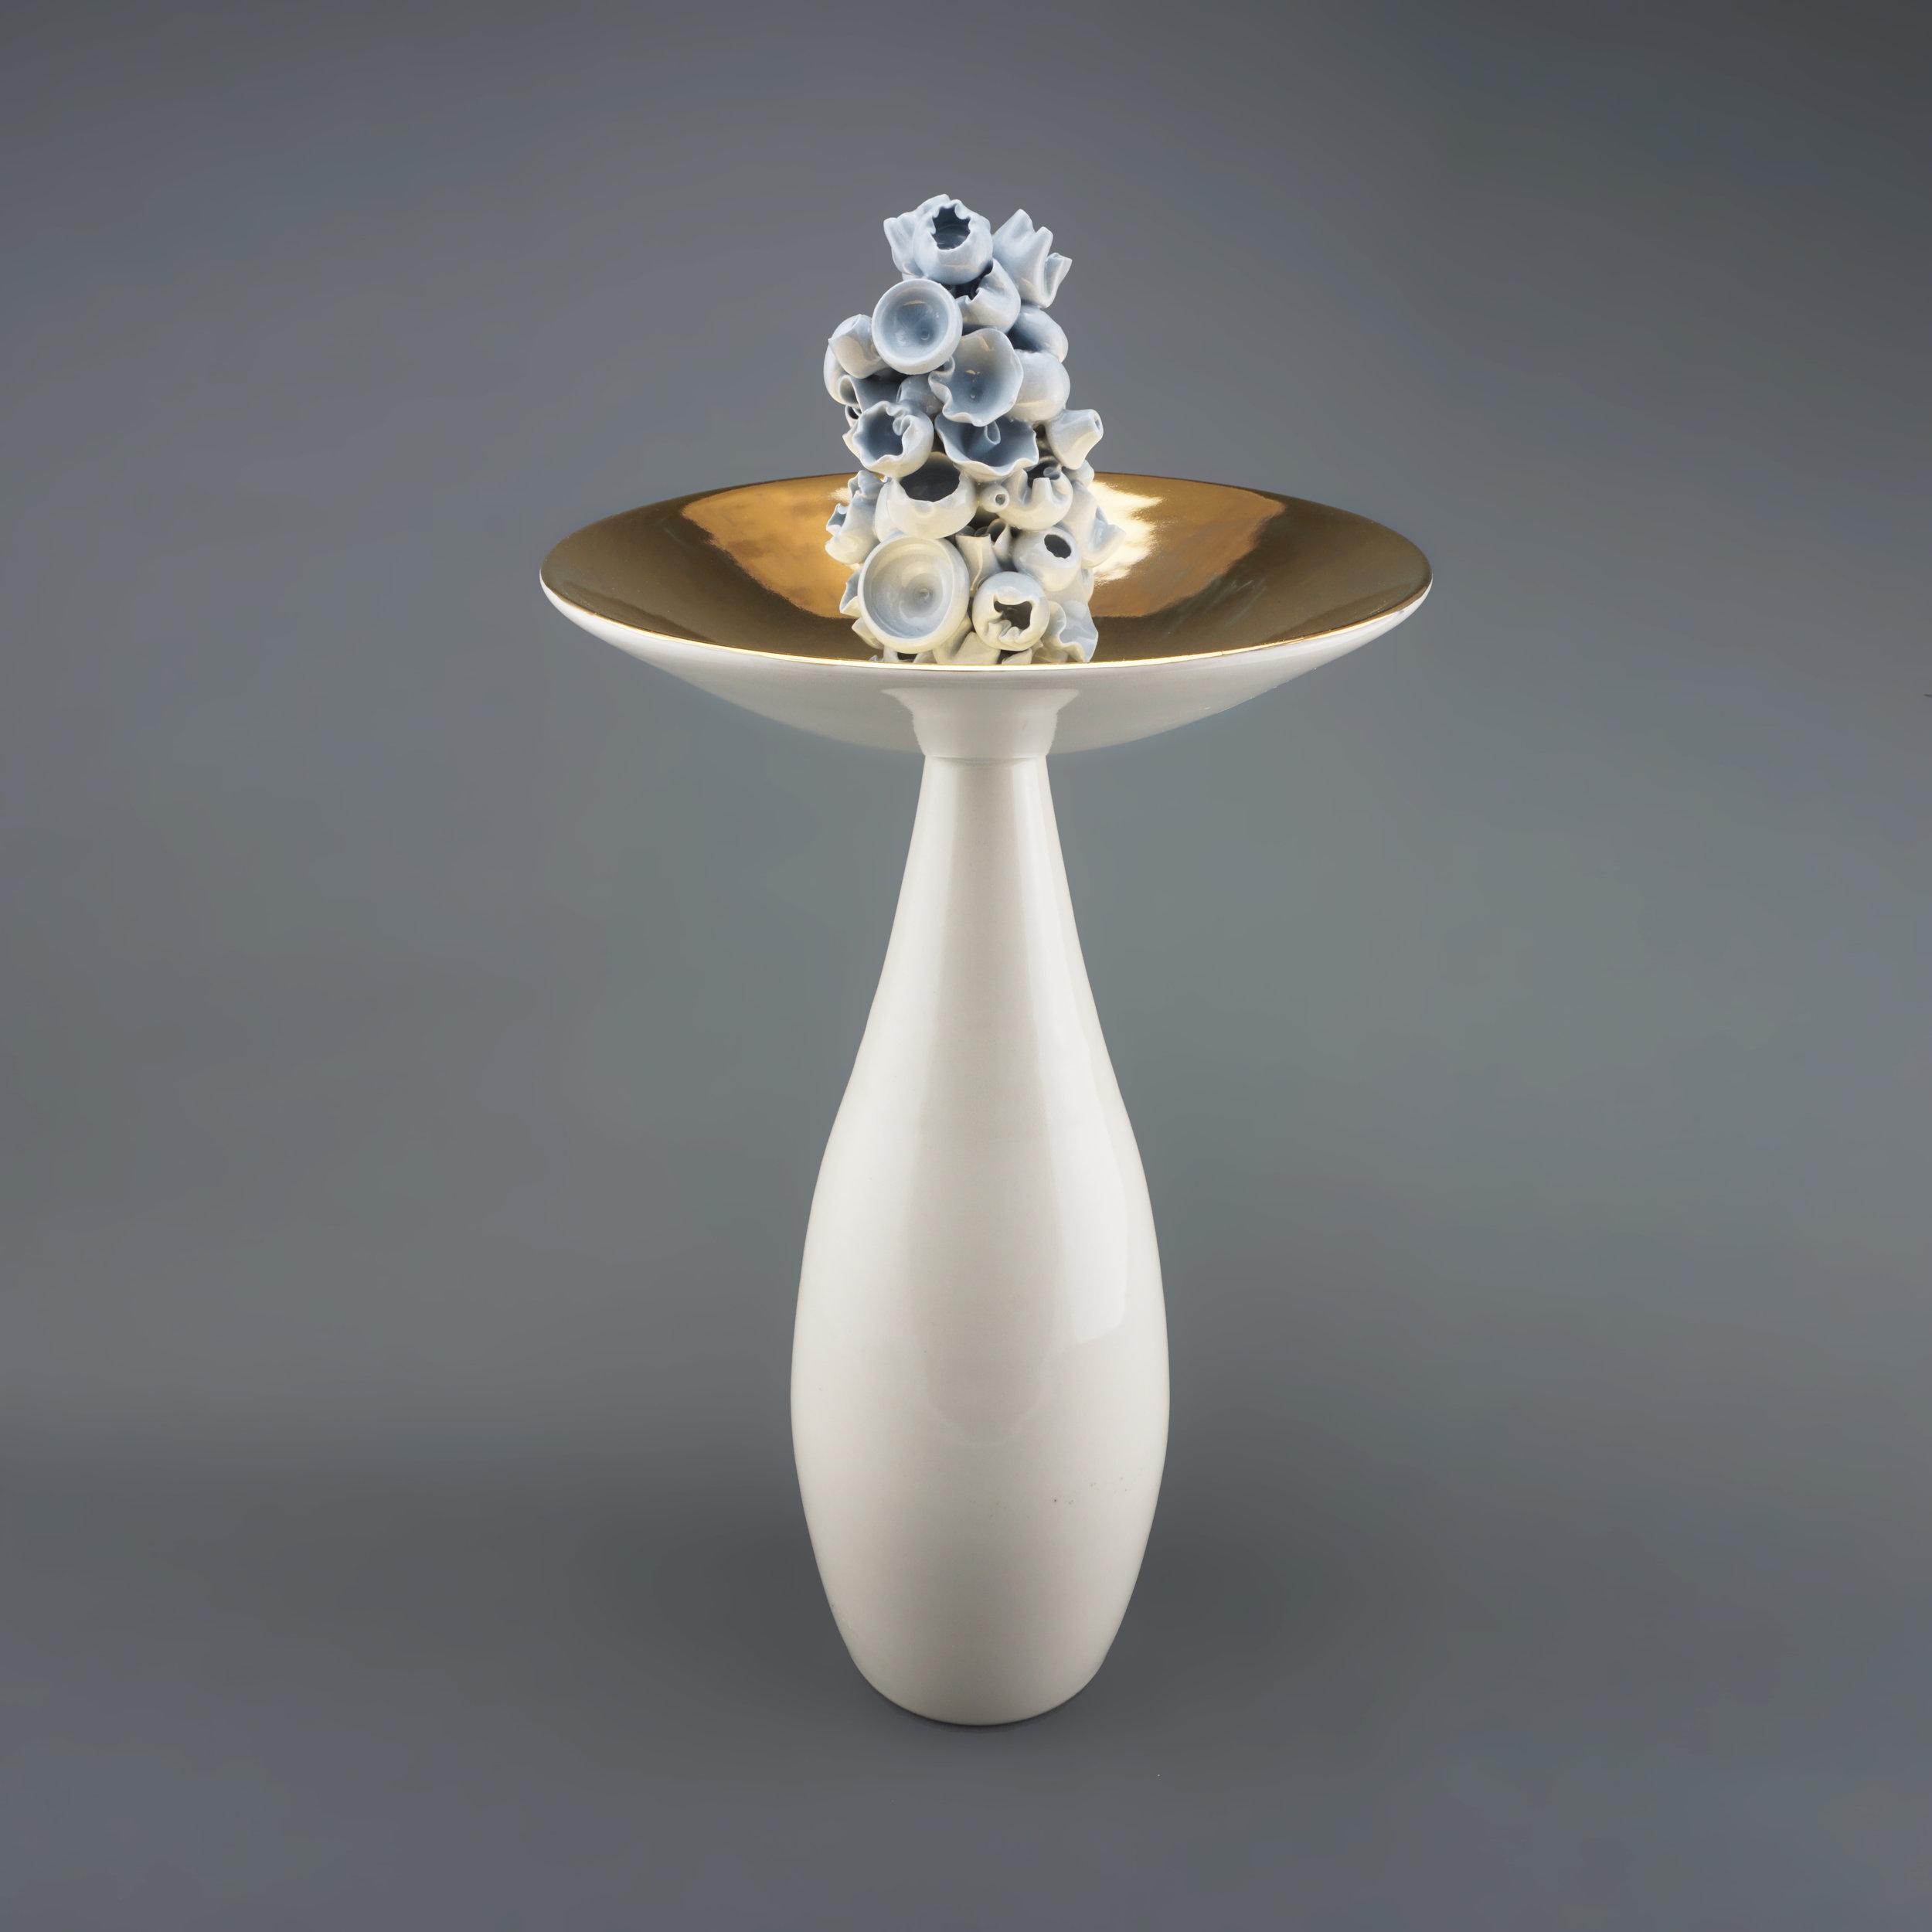 tall bowl sculpture w flowers.jpg